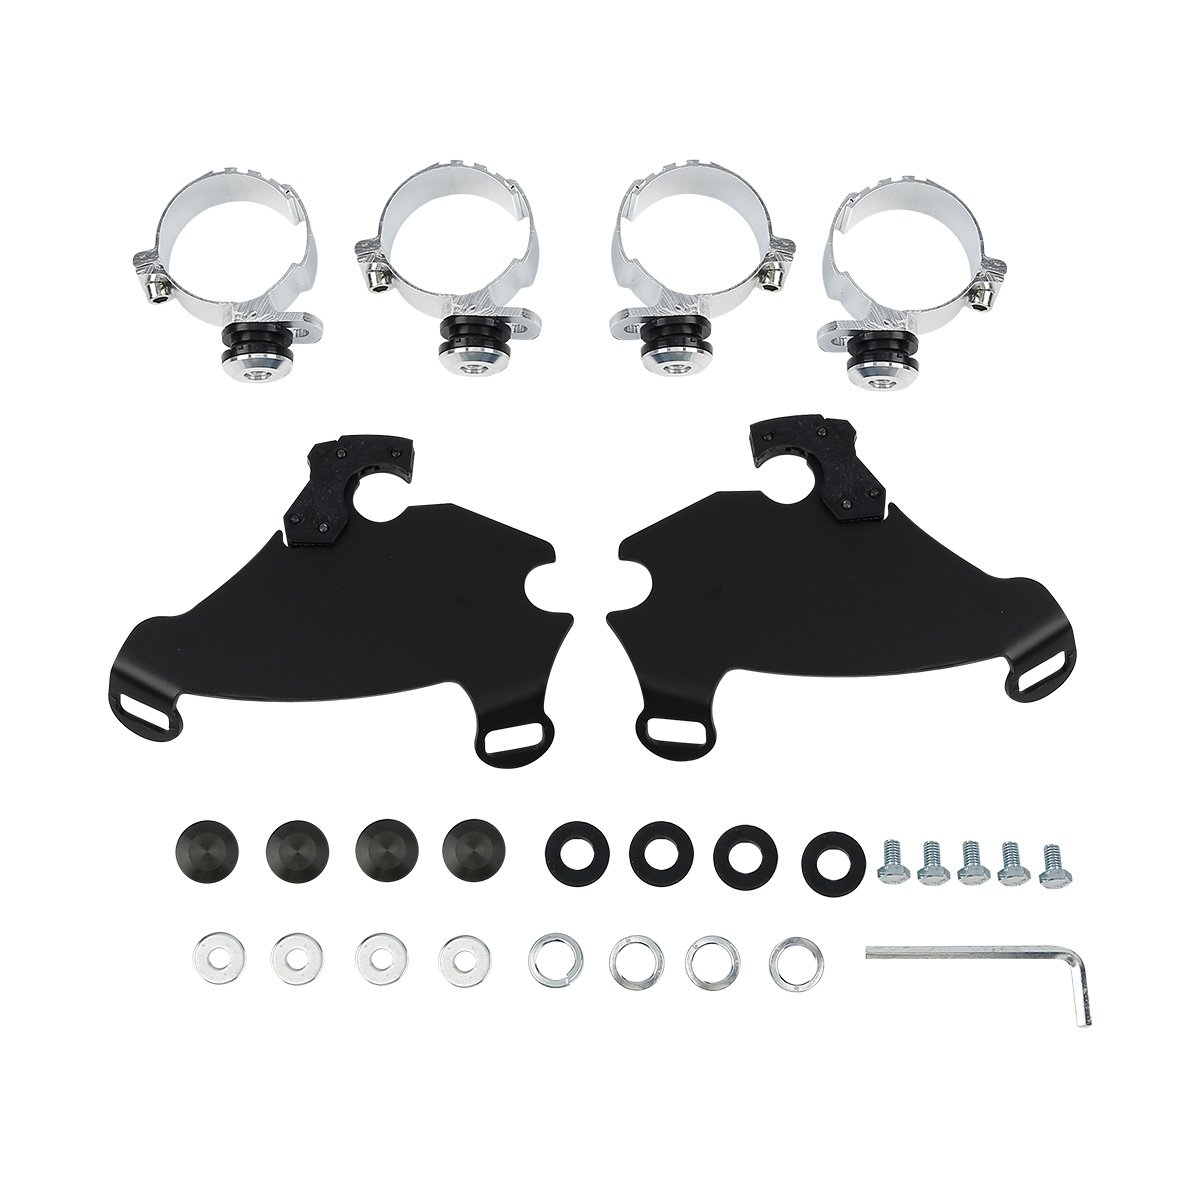 XMT-MOTO Black 49mm Gauntlet Fairing Trigger Lock Mount For Harley FXD Dyna Super Glide 2006-2010,FXDC Dyna Super Glide Custom 2006-2014,FXDL Dyna Low Rider 2014-2016,FXDL Dyna Low Rider 2014-2016,etc